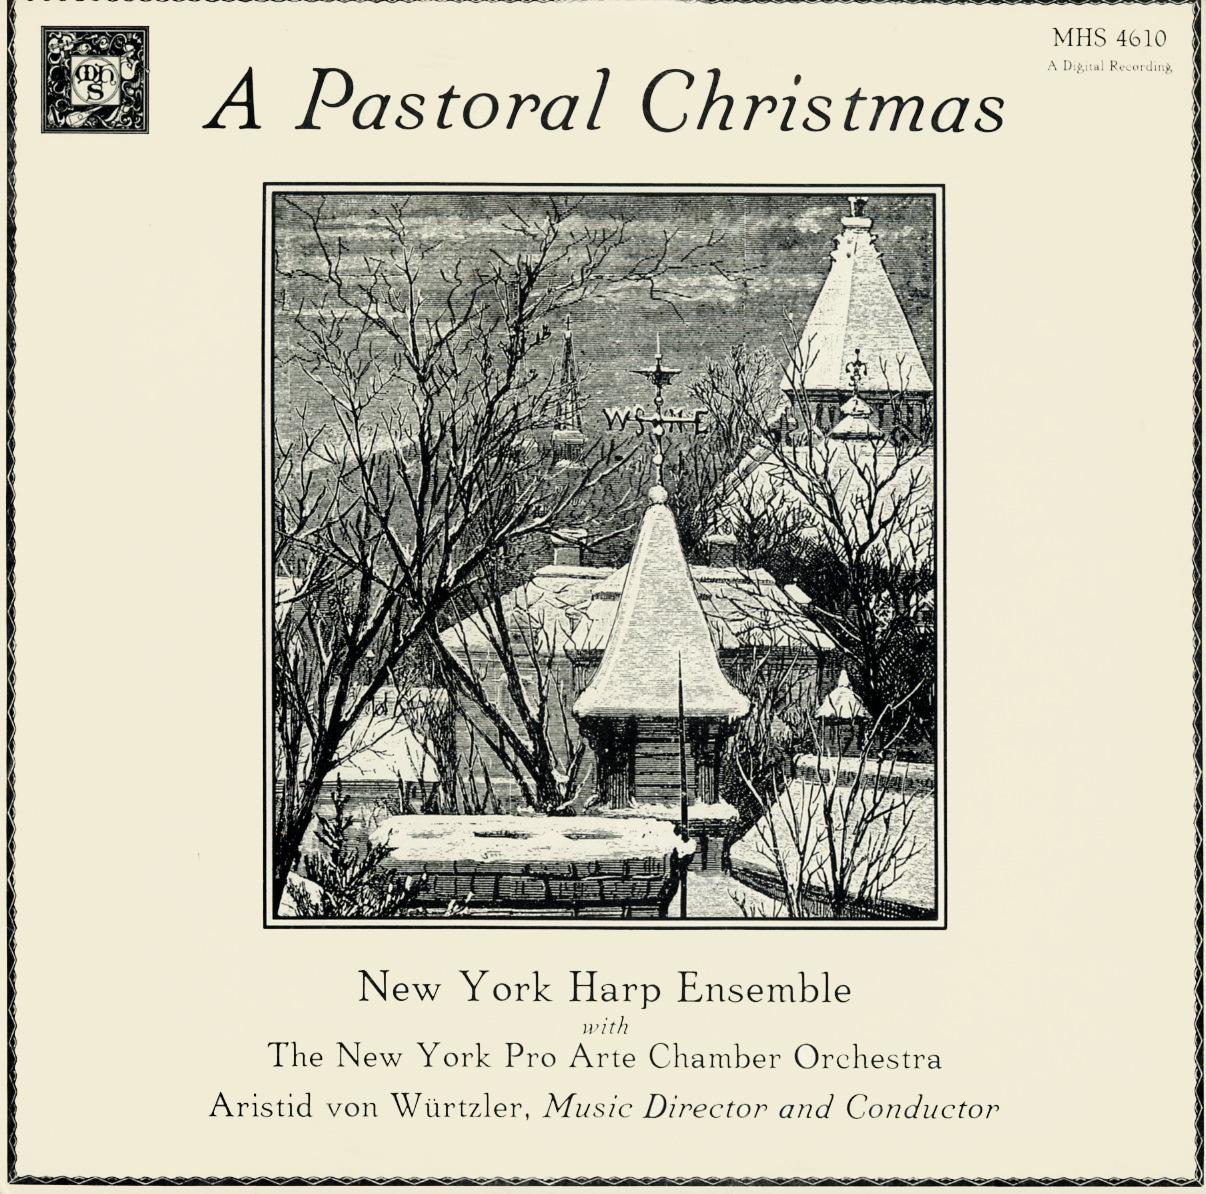 CD - New York Harp Ensemble Pastoral Christmas